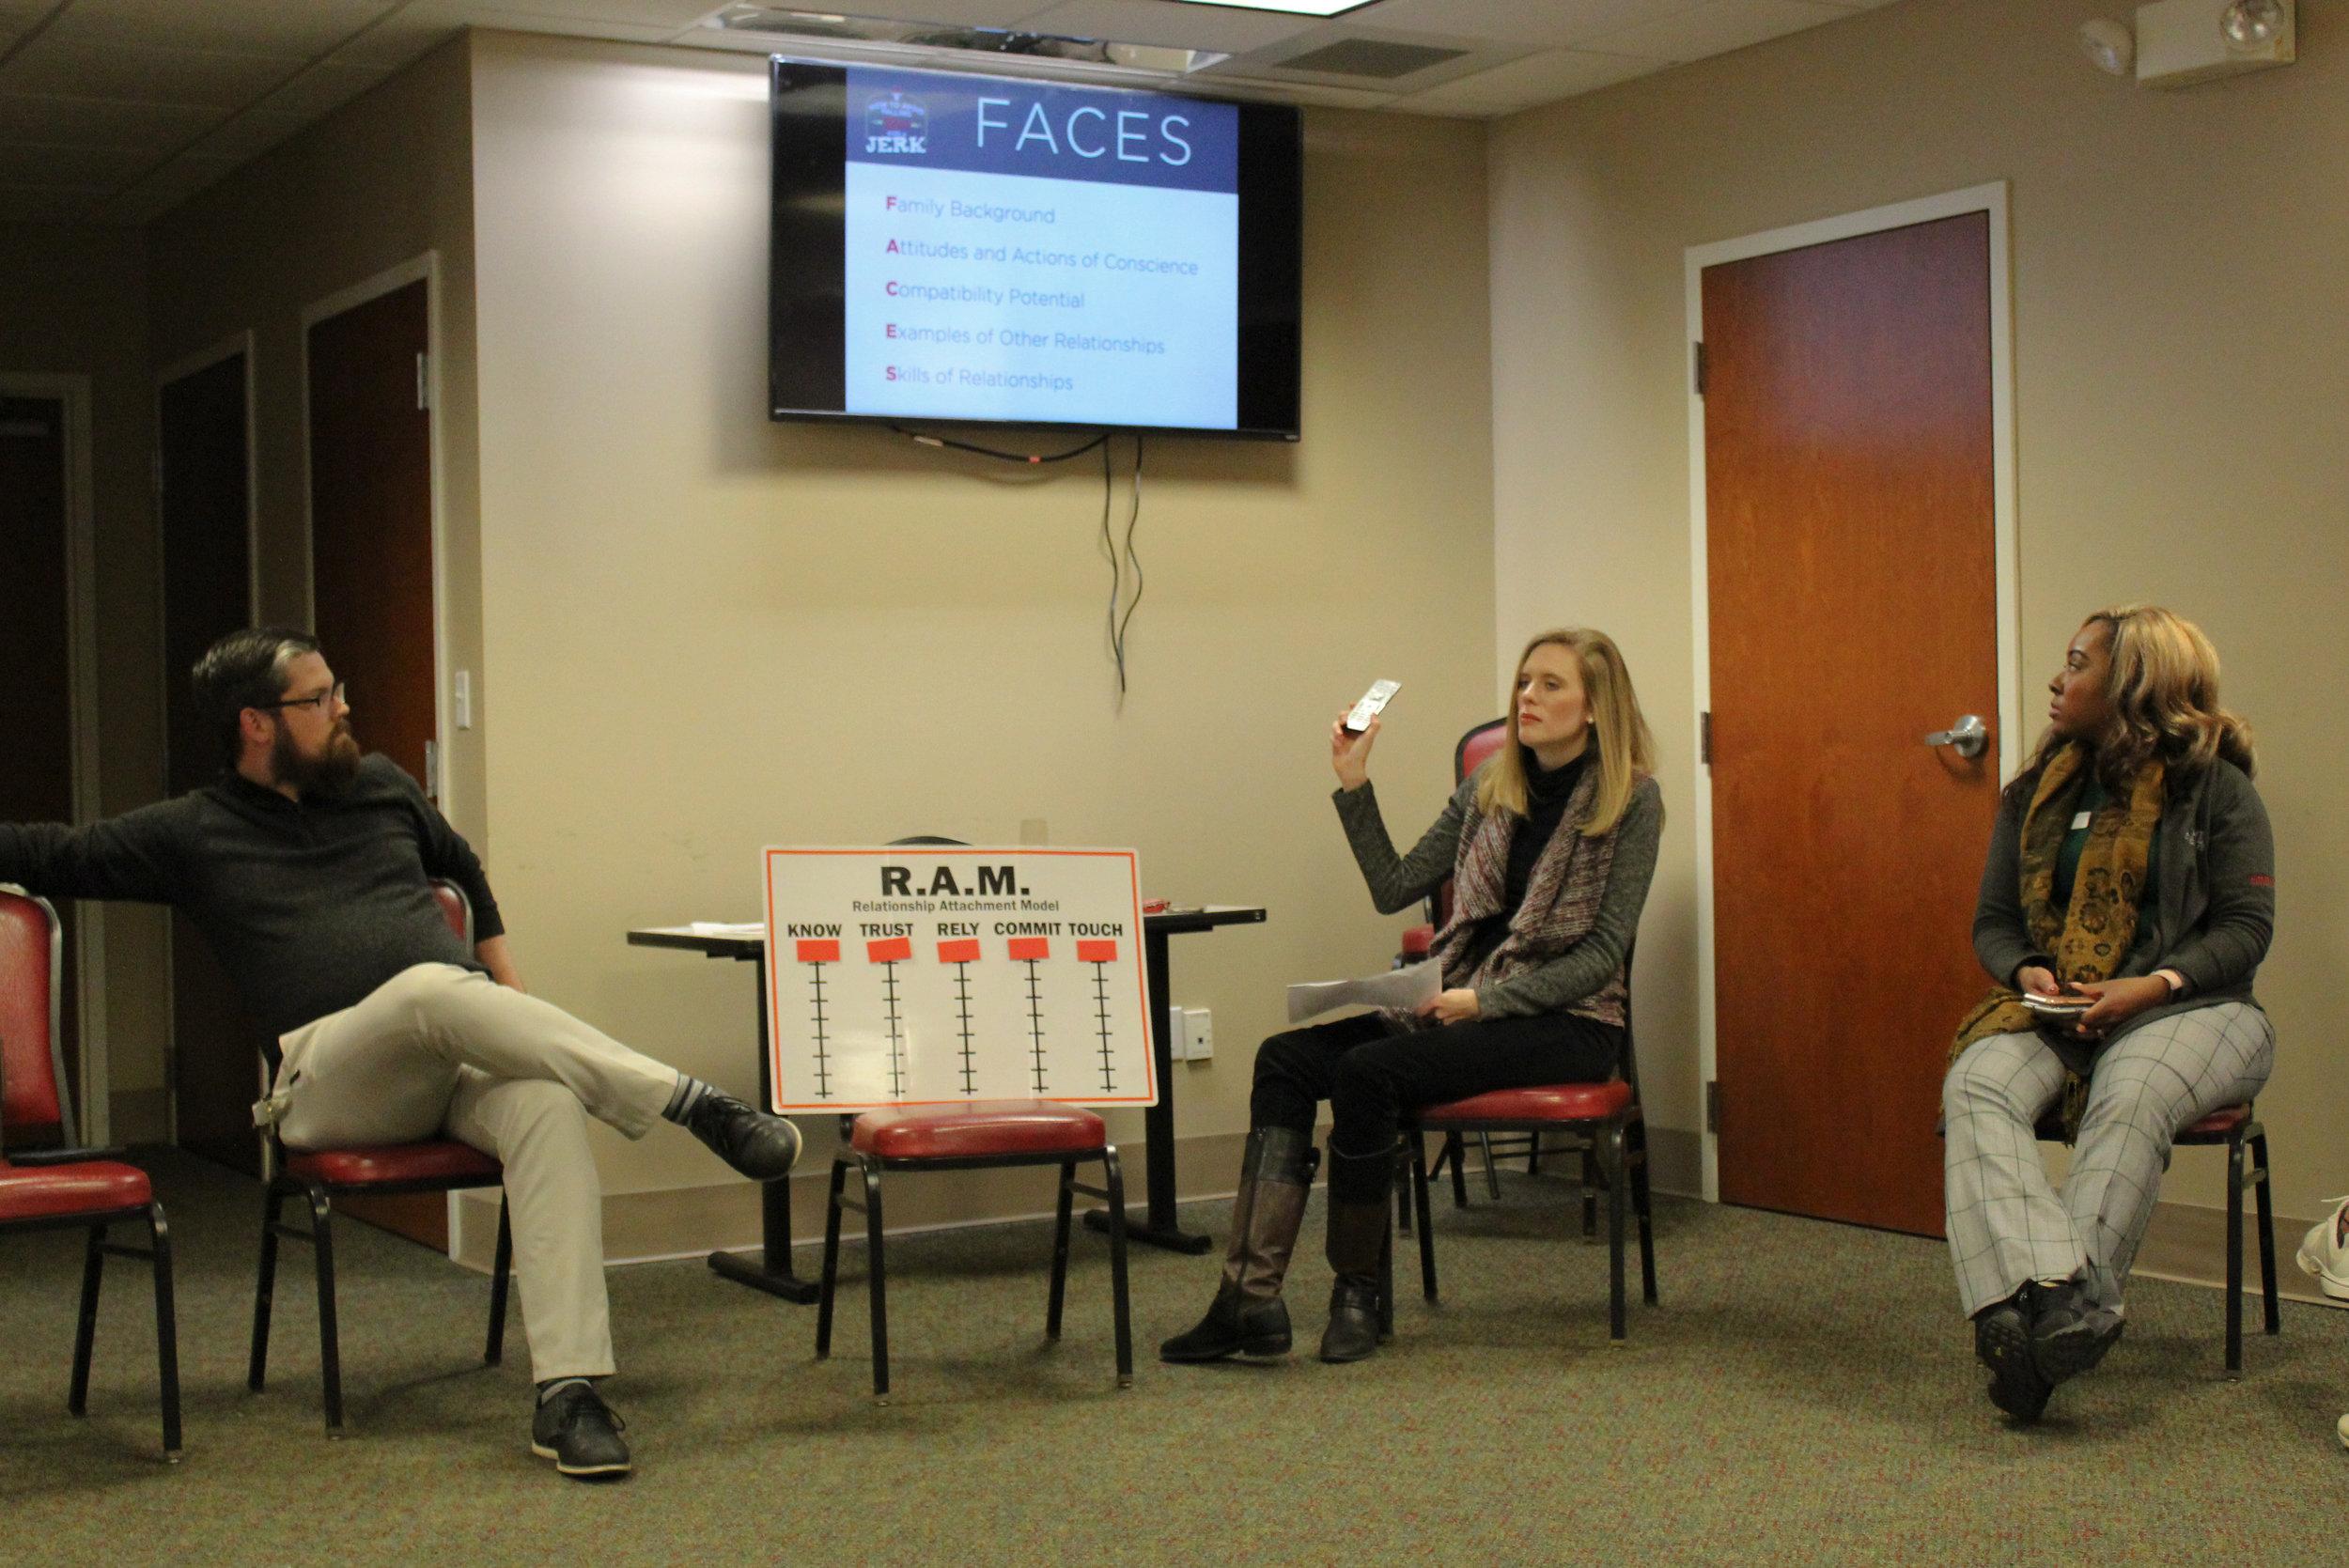 Faculty Mr Jared Thomas, Mrs. Black and Mrs. Jarrett describe the seminar's purpose.